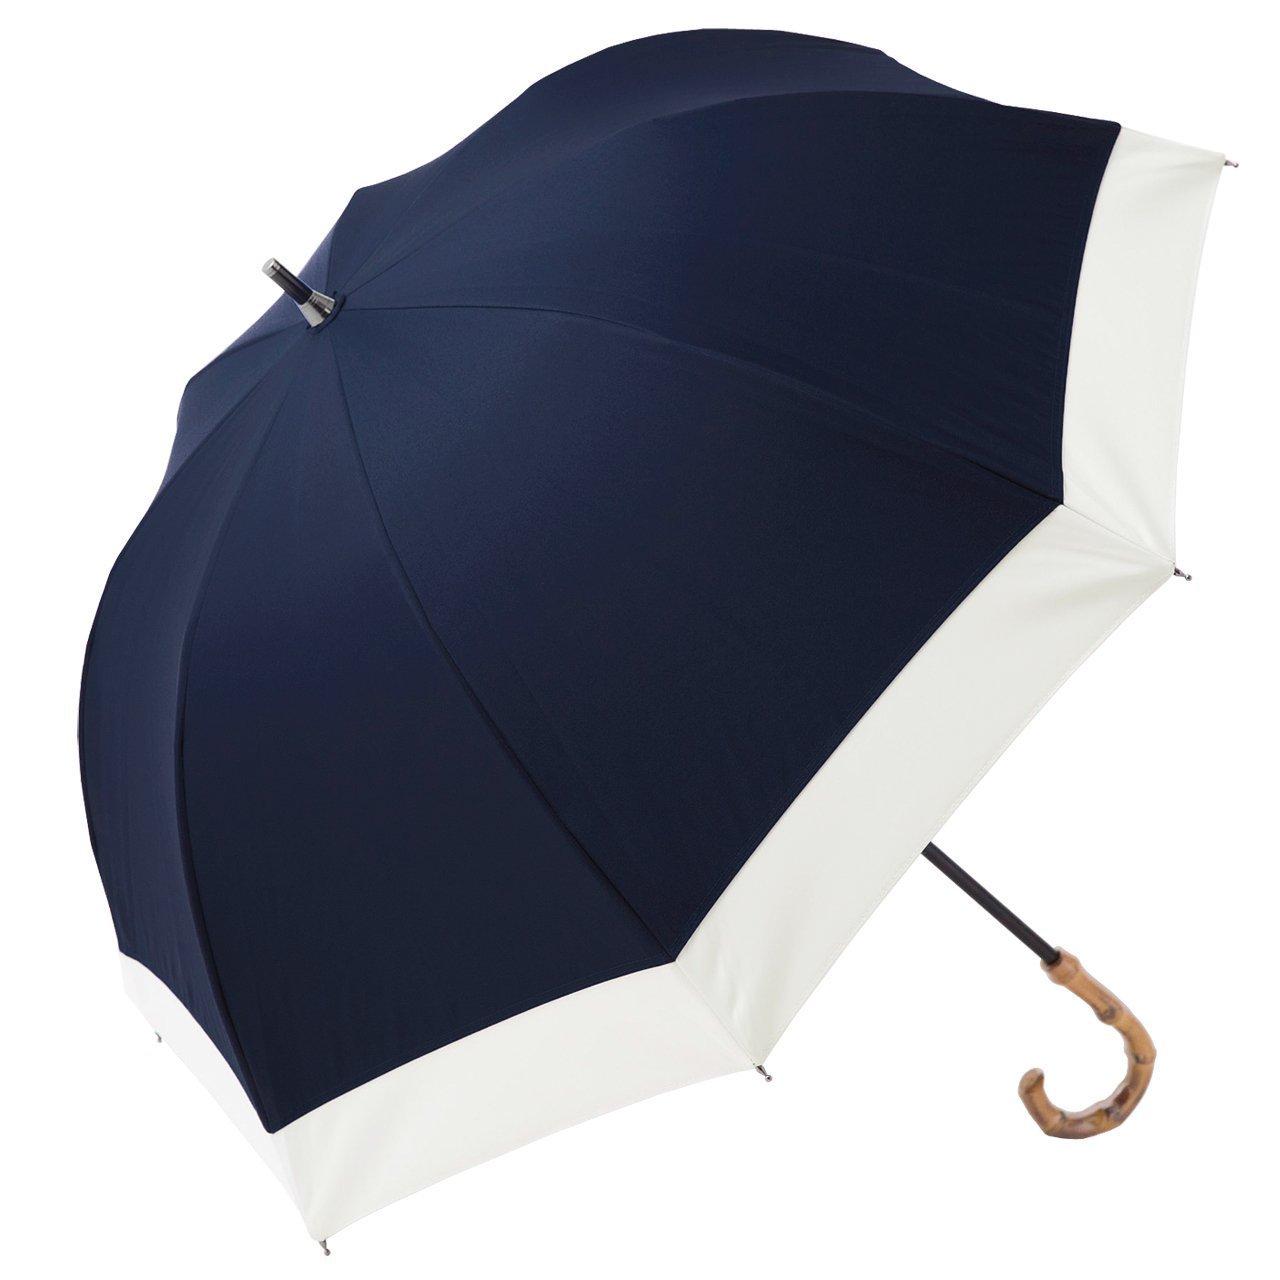 【Rose Blanc】100%完全遮光 日傘 レディース ショートサイズ コンビ プレーン 50cm (ネイビー×アイボリー) B07BZGZXBMネイビー×アイボリー